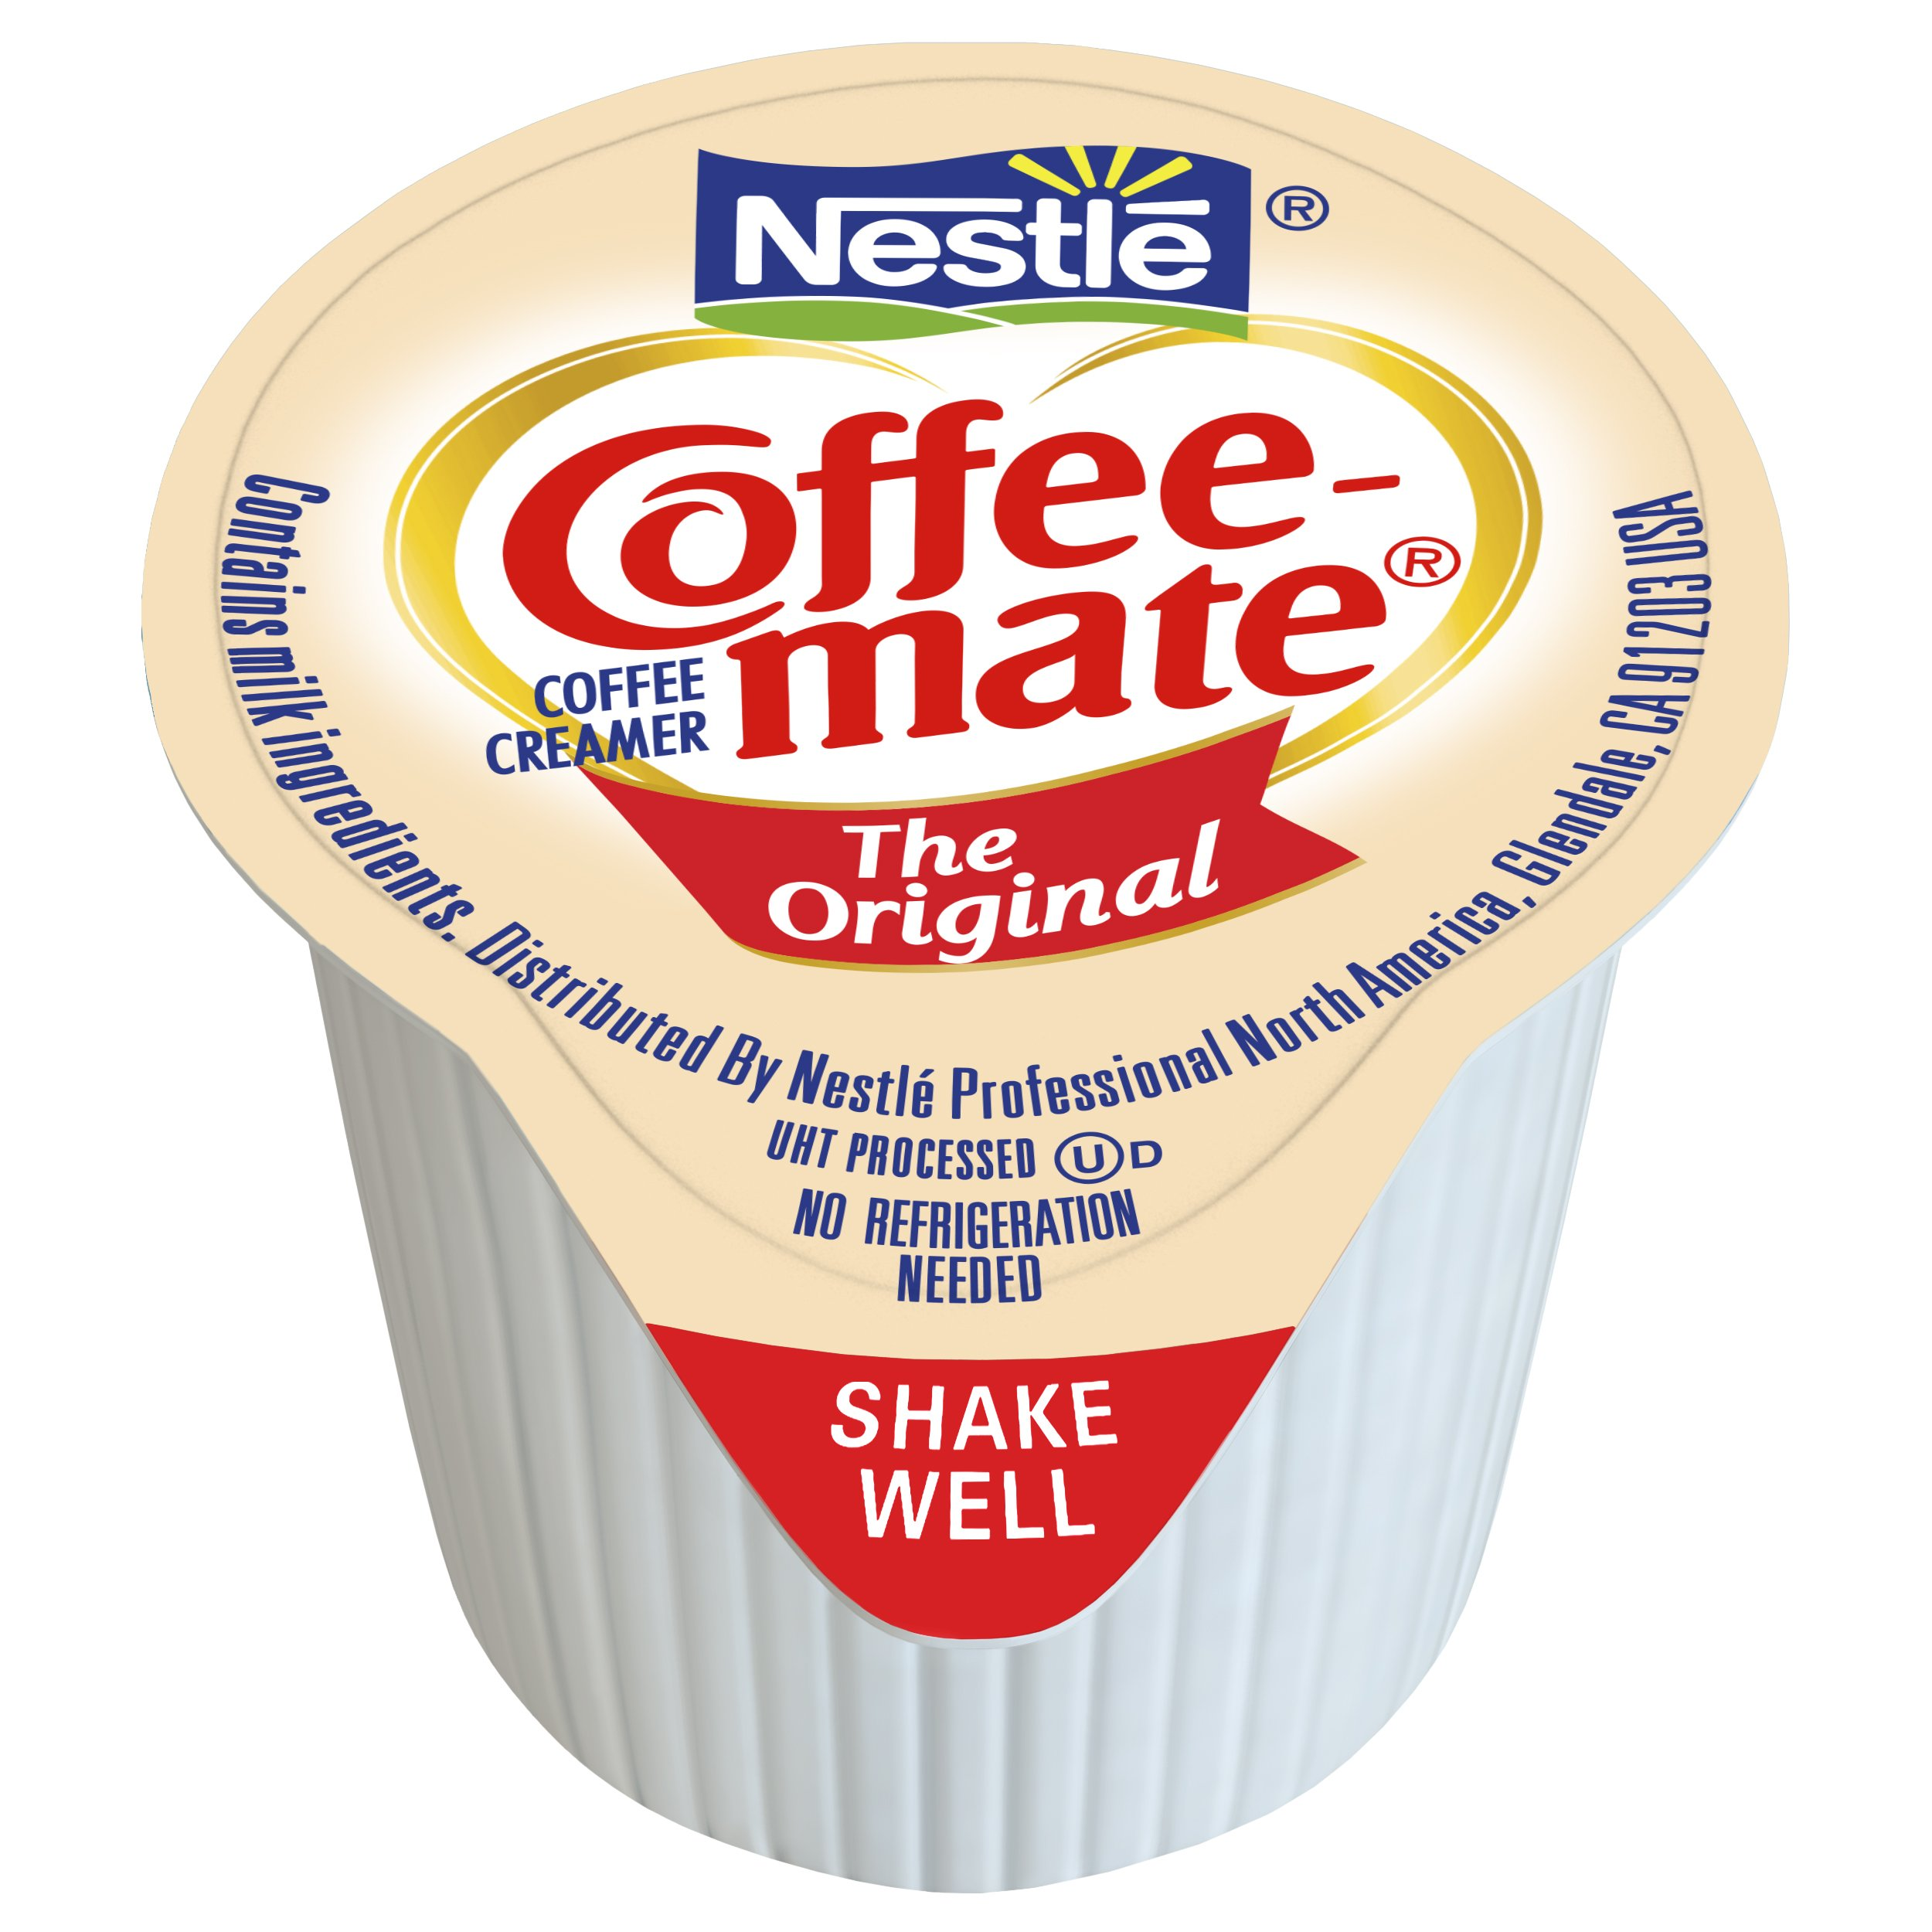 NESTLE COFFEE-MATE Coffee Creamer, Original, liquid creamer singles, 360 Count (Pack of 1) by Nestle Coffee Mate (Image #2)